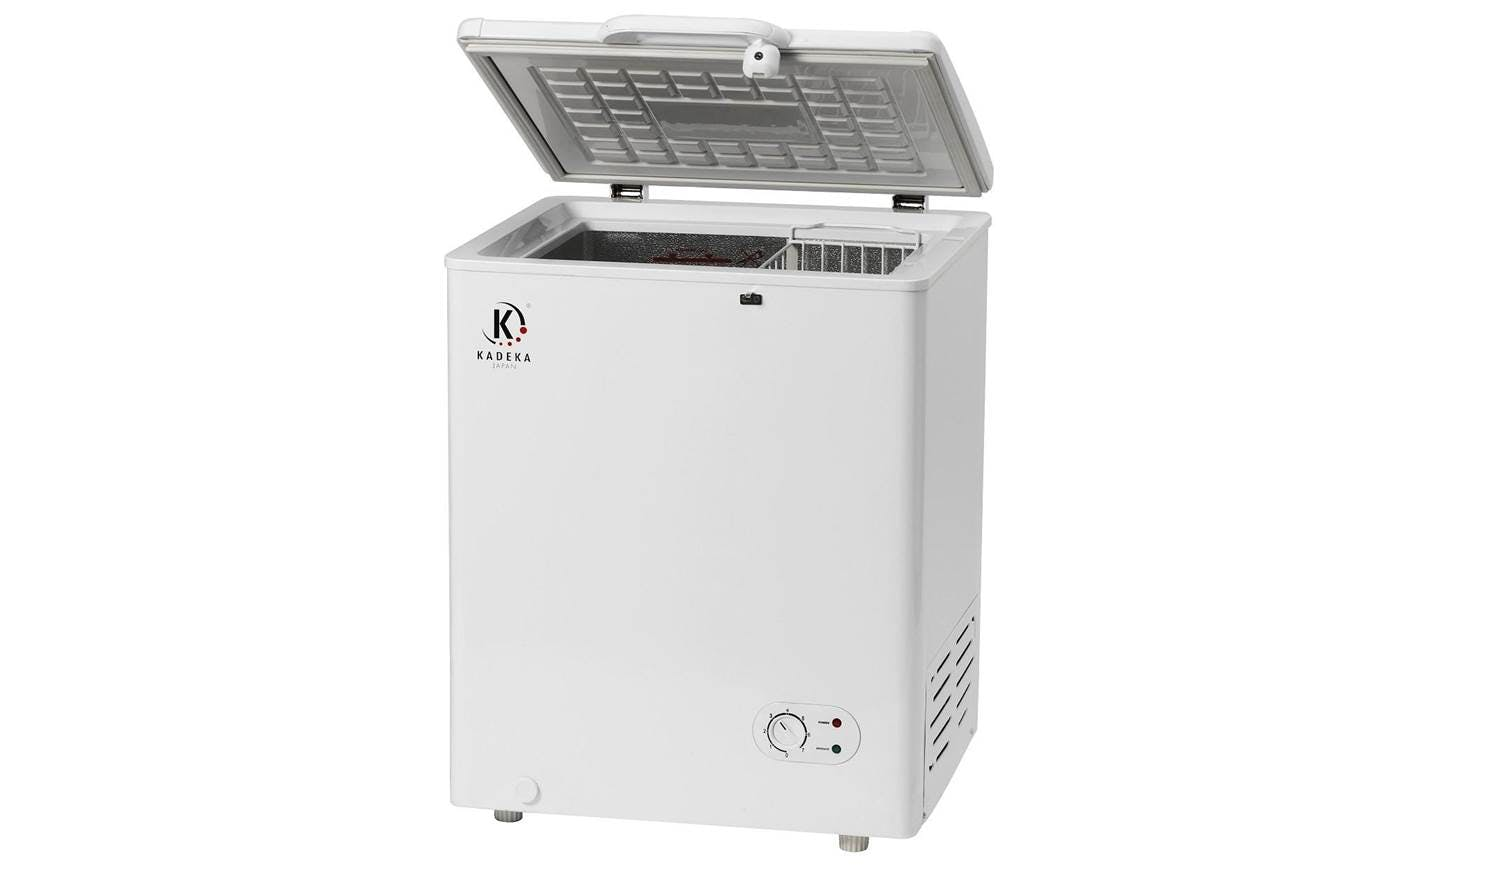 Refrigerator, Fridge, Mini Fridge, Freezer – Samsung Fridge | Harvey ...